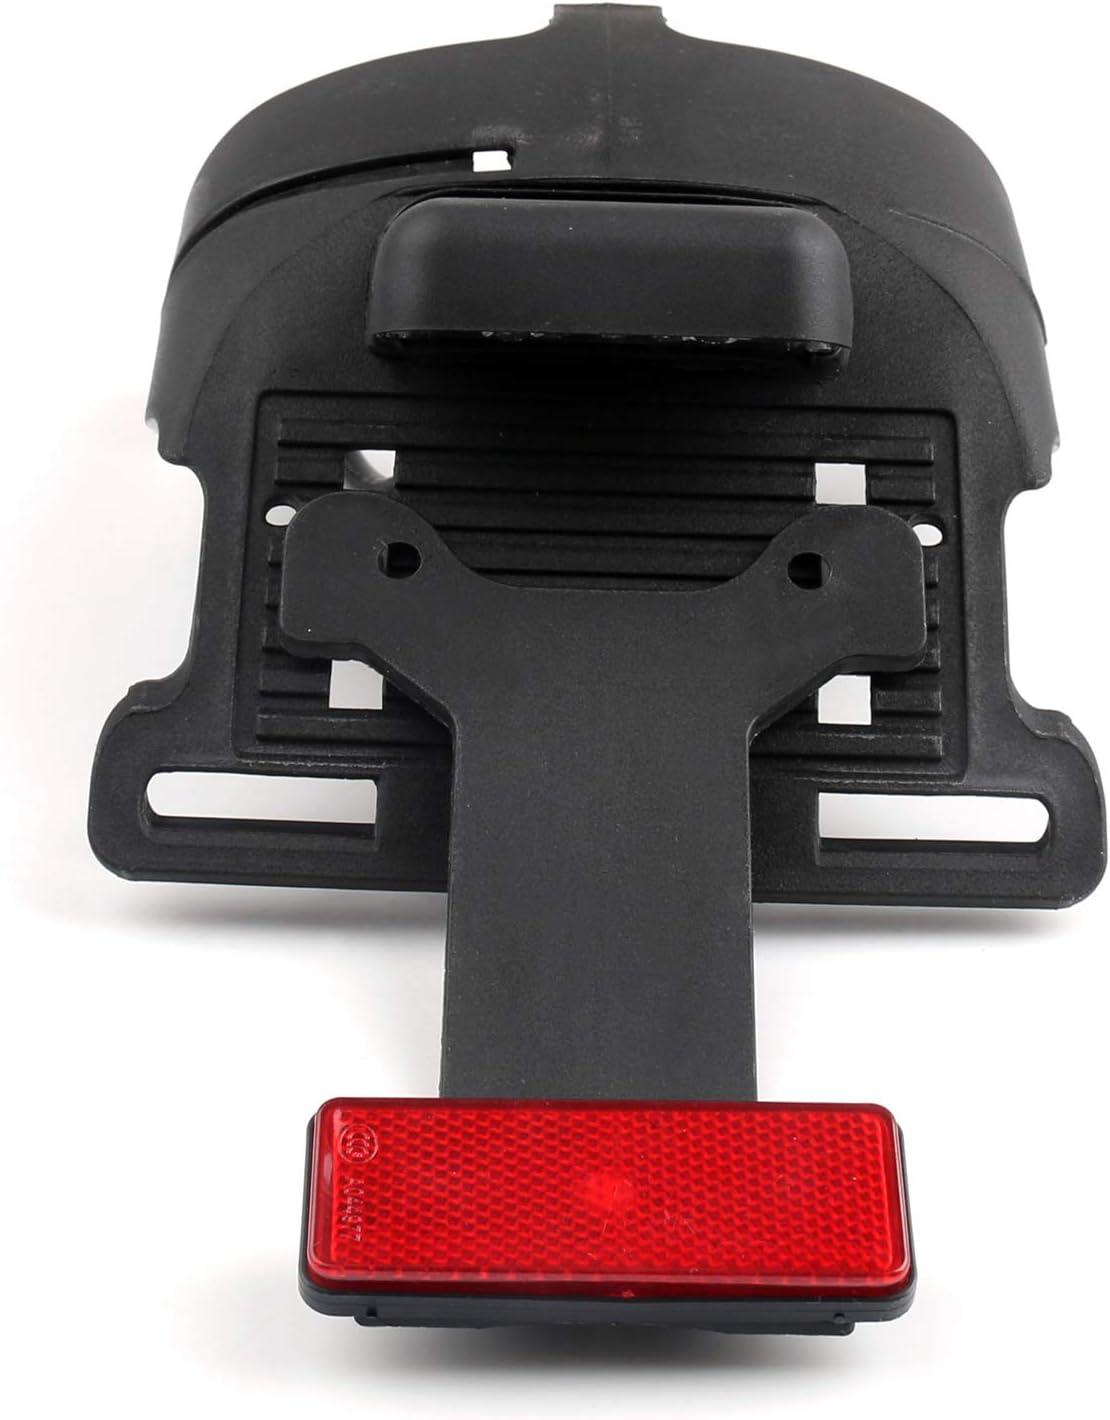 Topteng Rear Fender Mount License Plate BrakeLight for Sports-ter XL 883 1200 48 04-2014